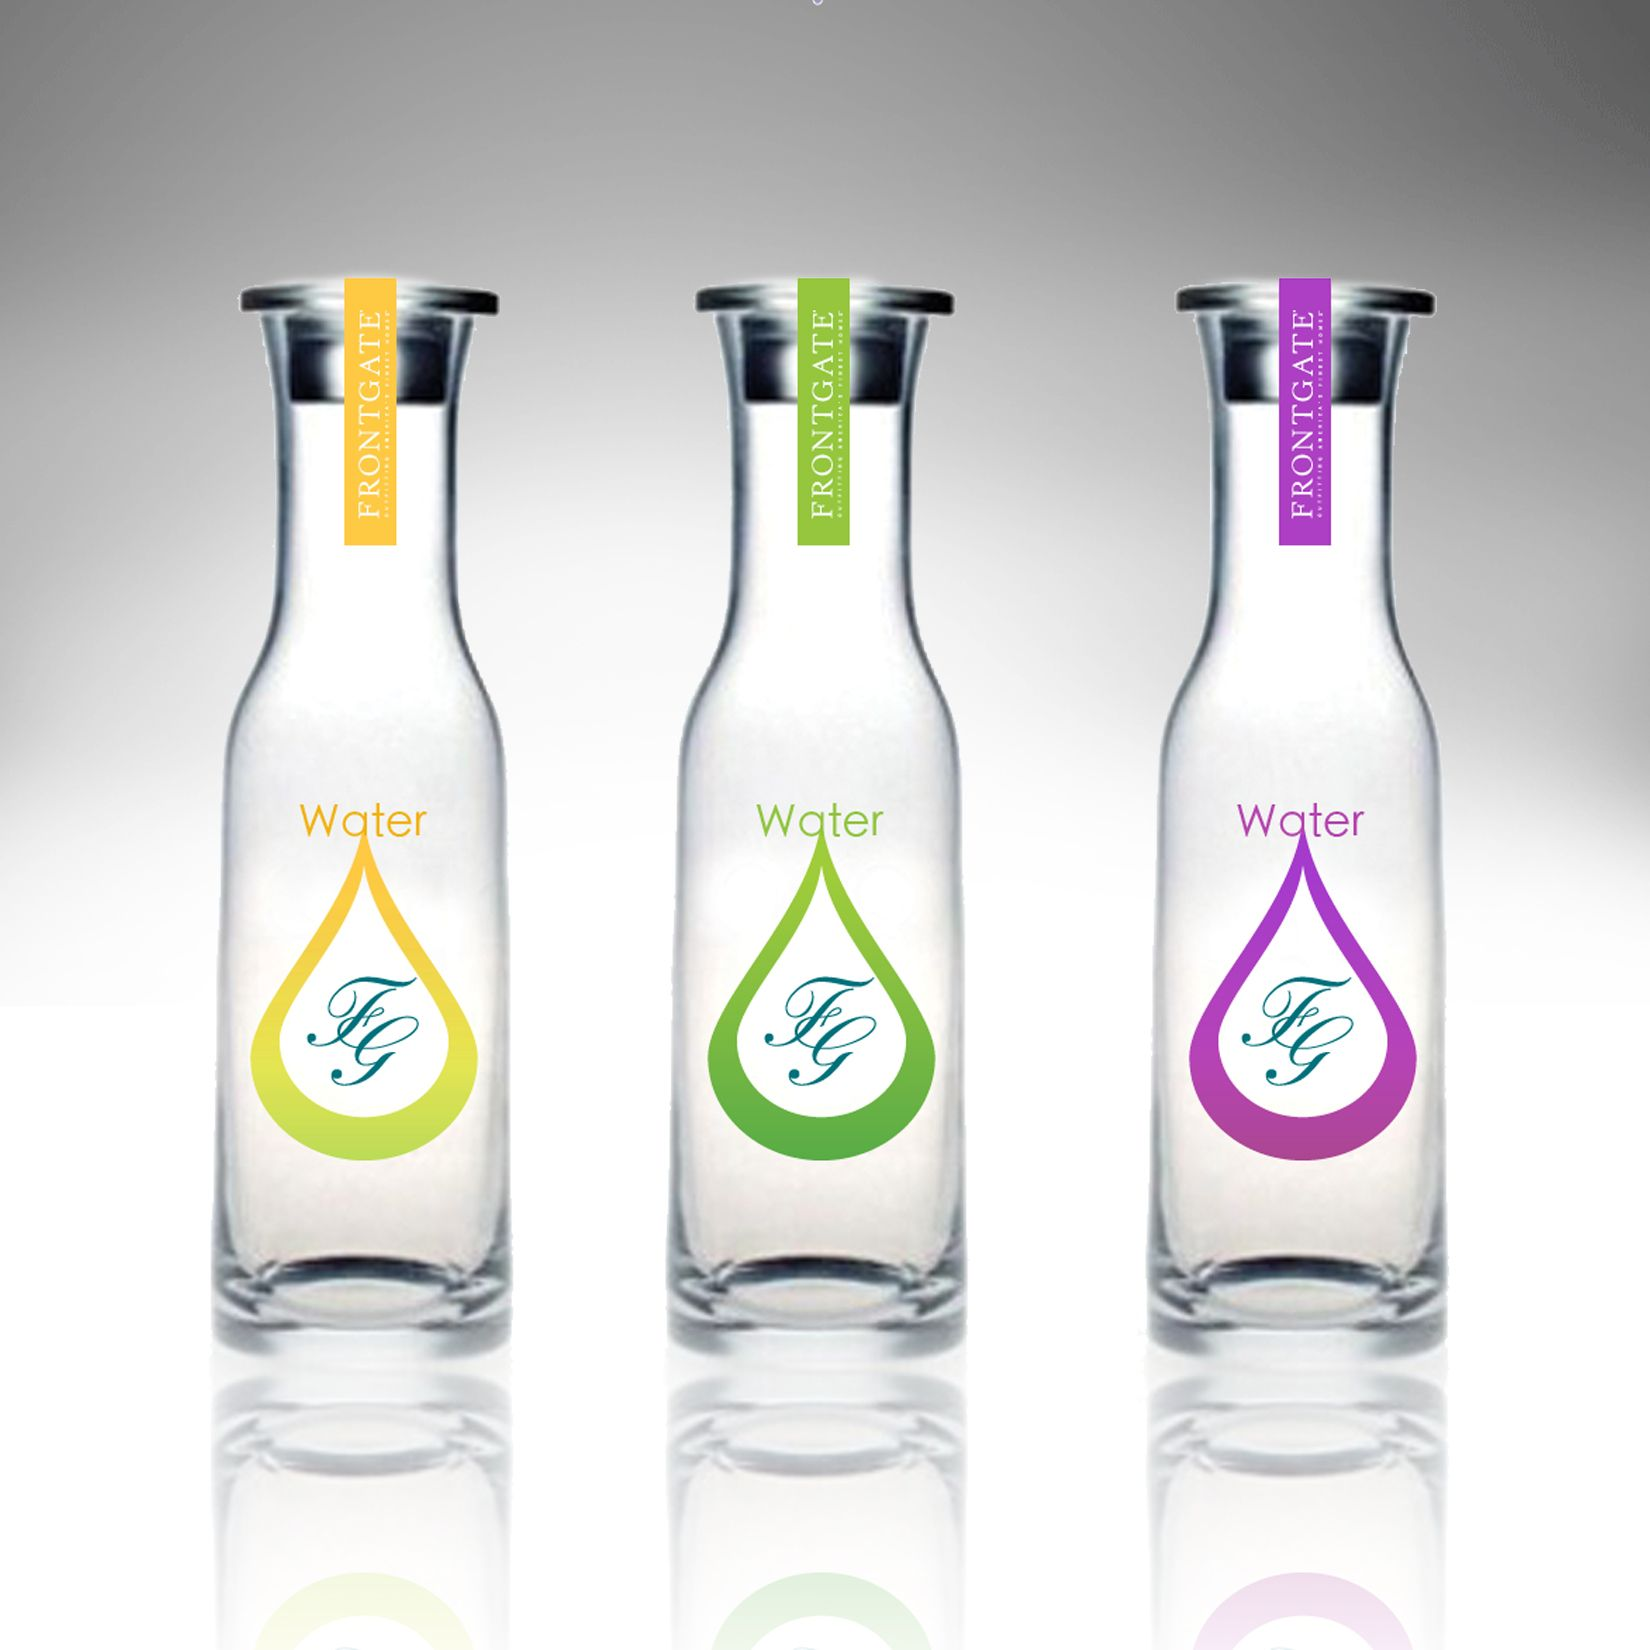 water bottles by Olga Cuzuioc Sinchevici at Coroflot.com